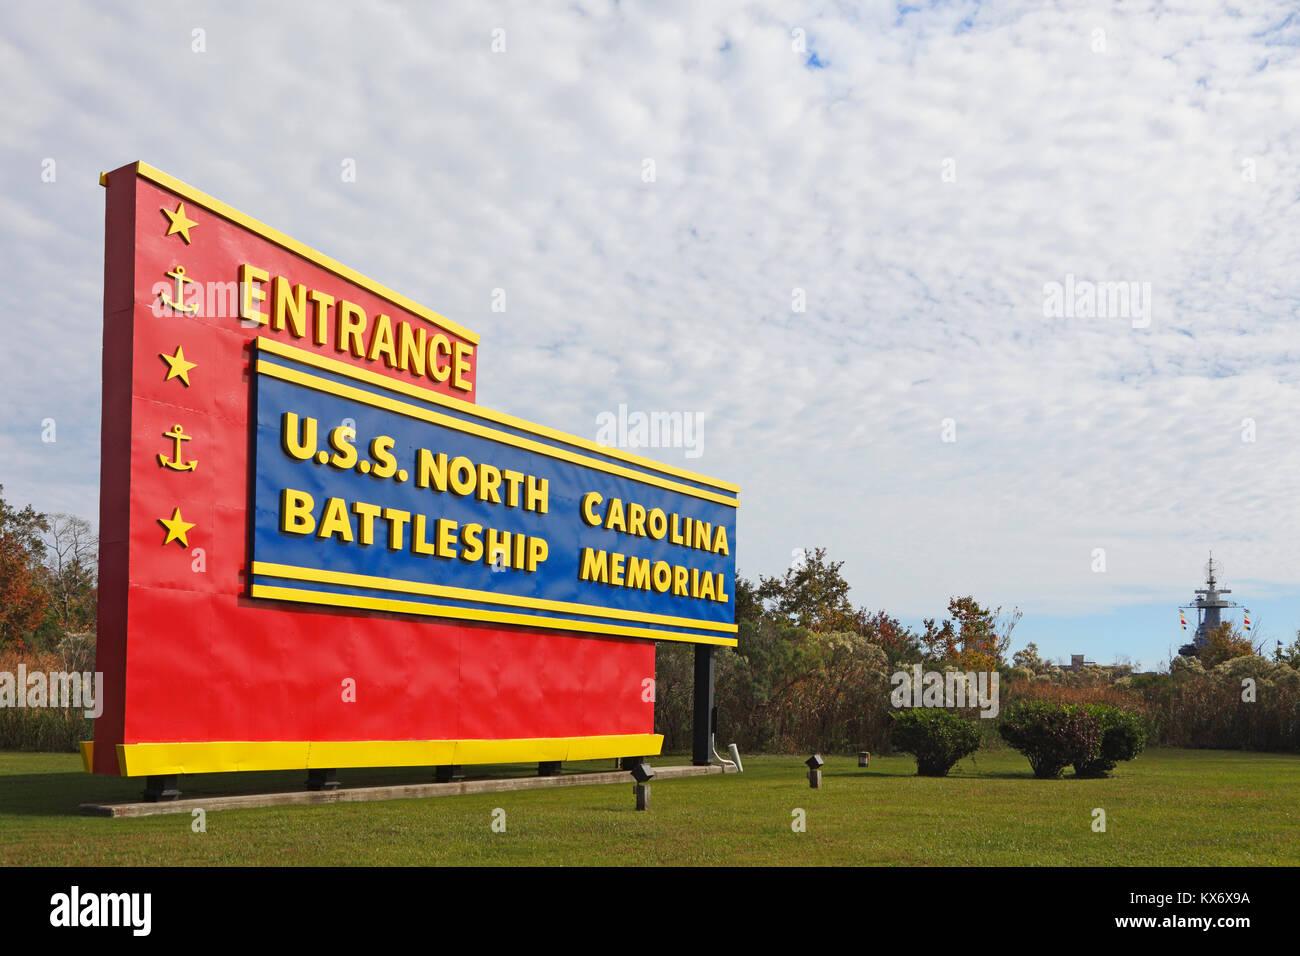 U.S.S North Carolina Battle Ship Memorial entrance sign, Wilmington, North Carolina - Stock Image